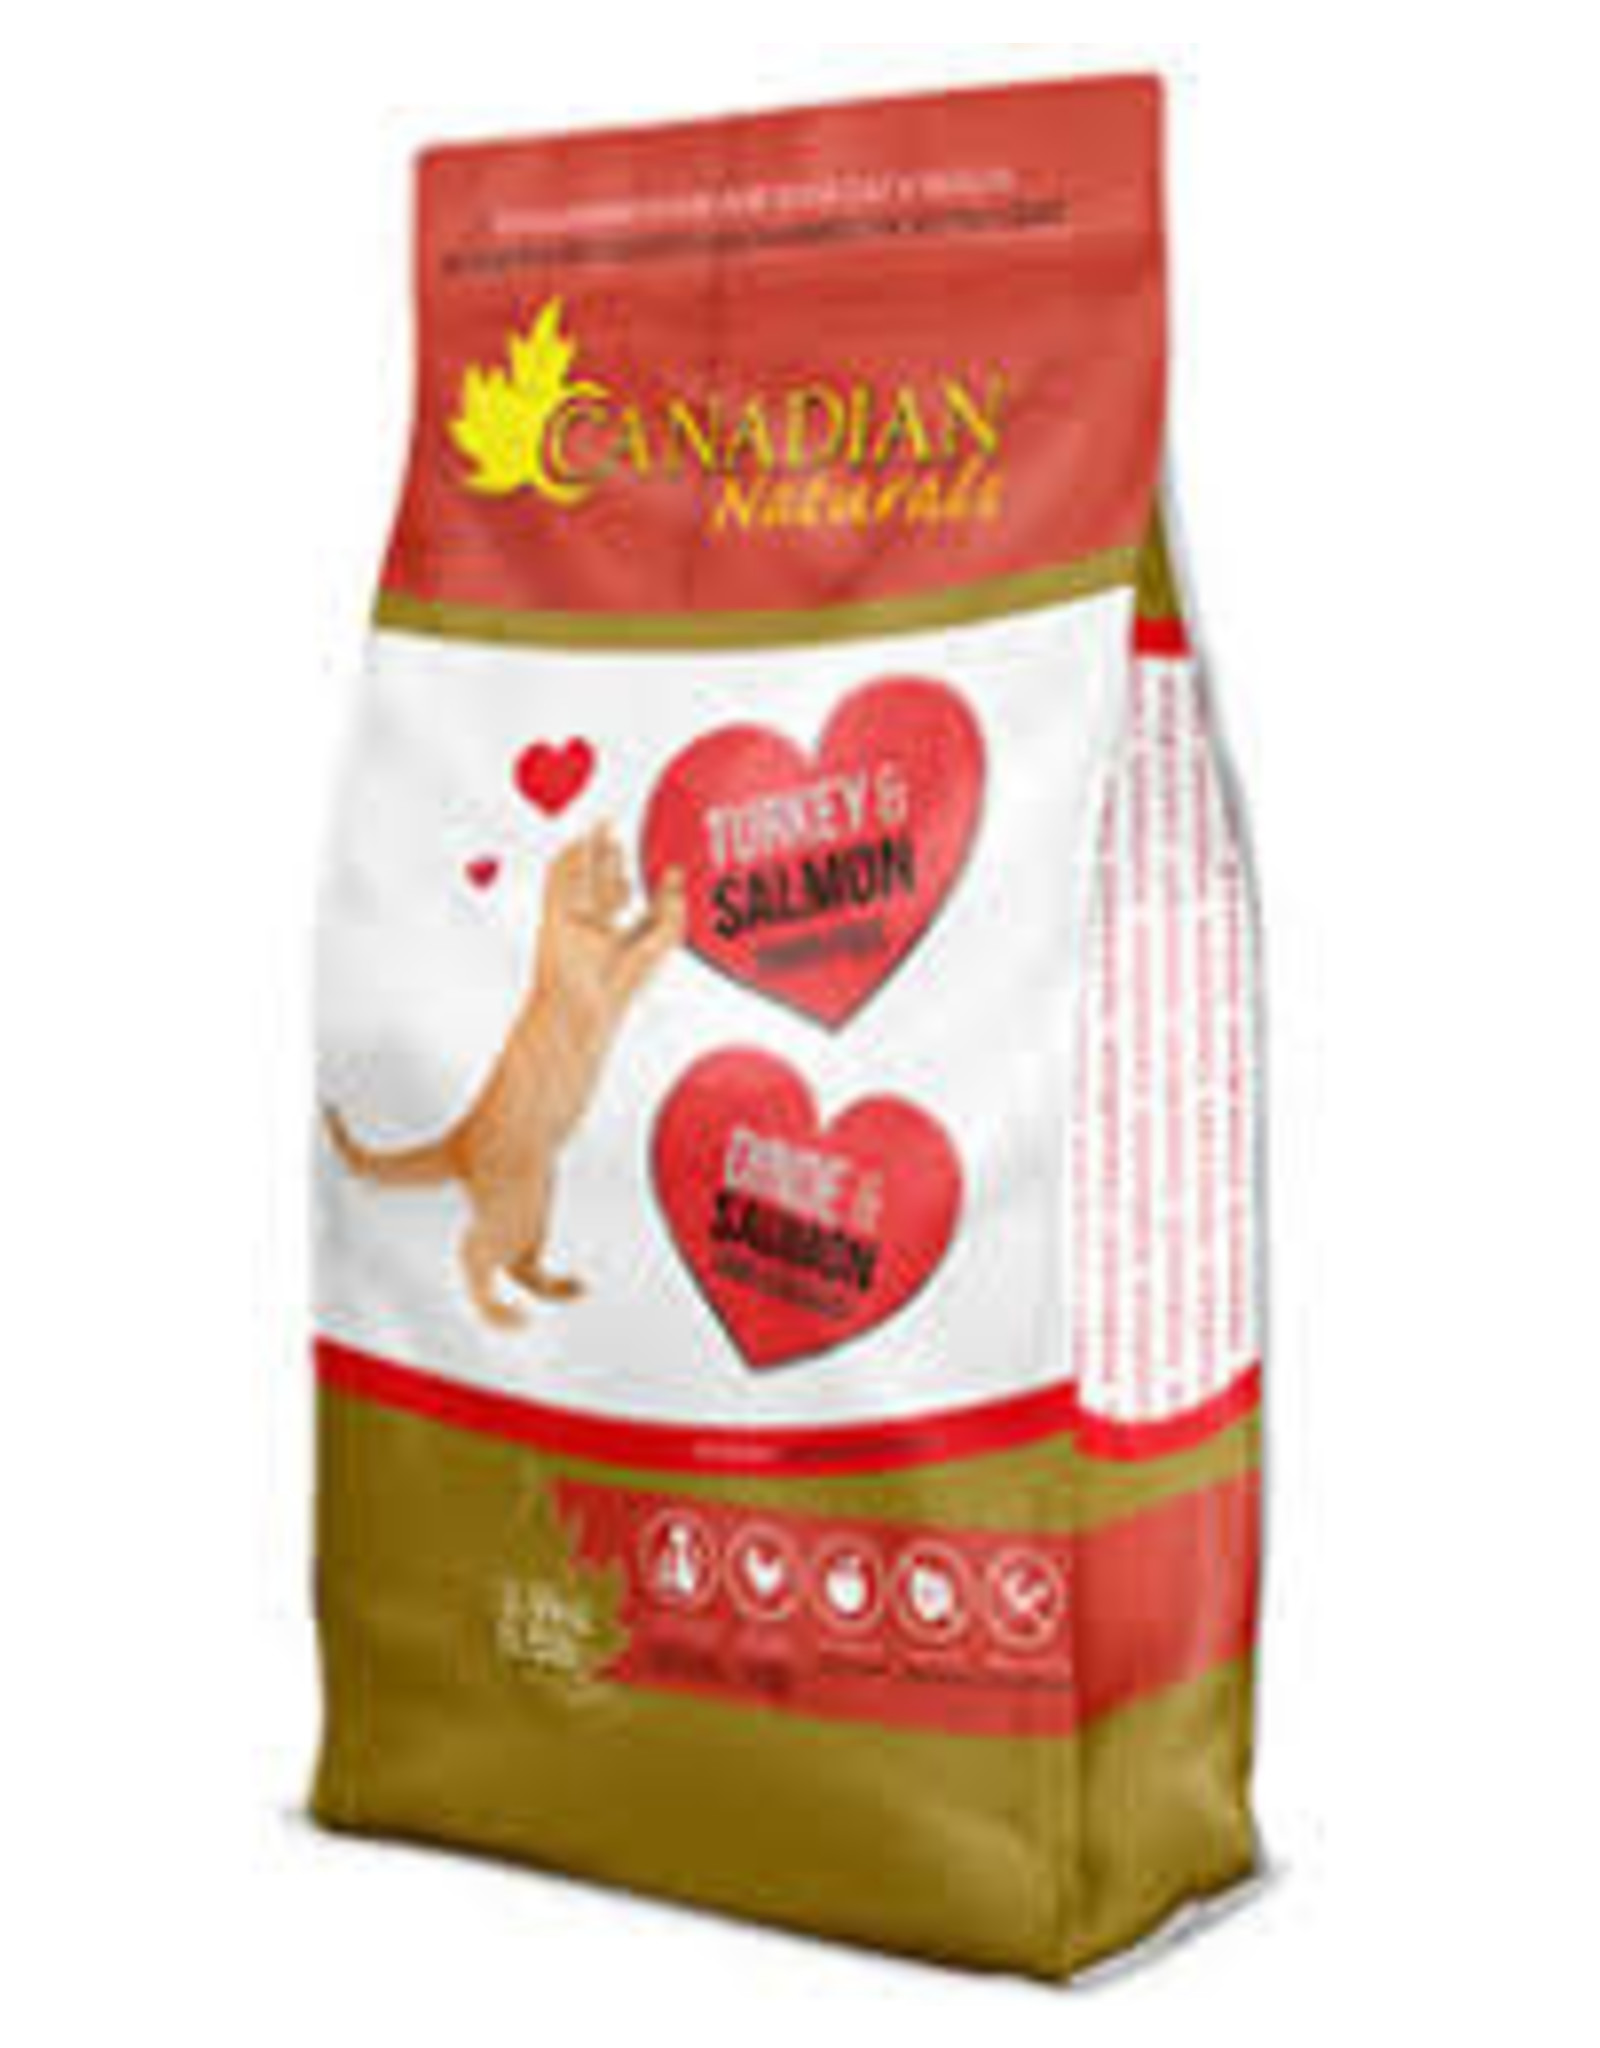 Canadian Naturals Canadian Naturals - GF Turkey & Salmon Cat